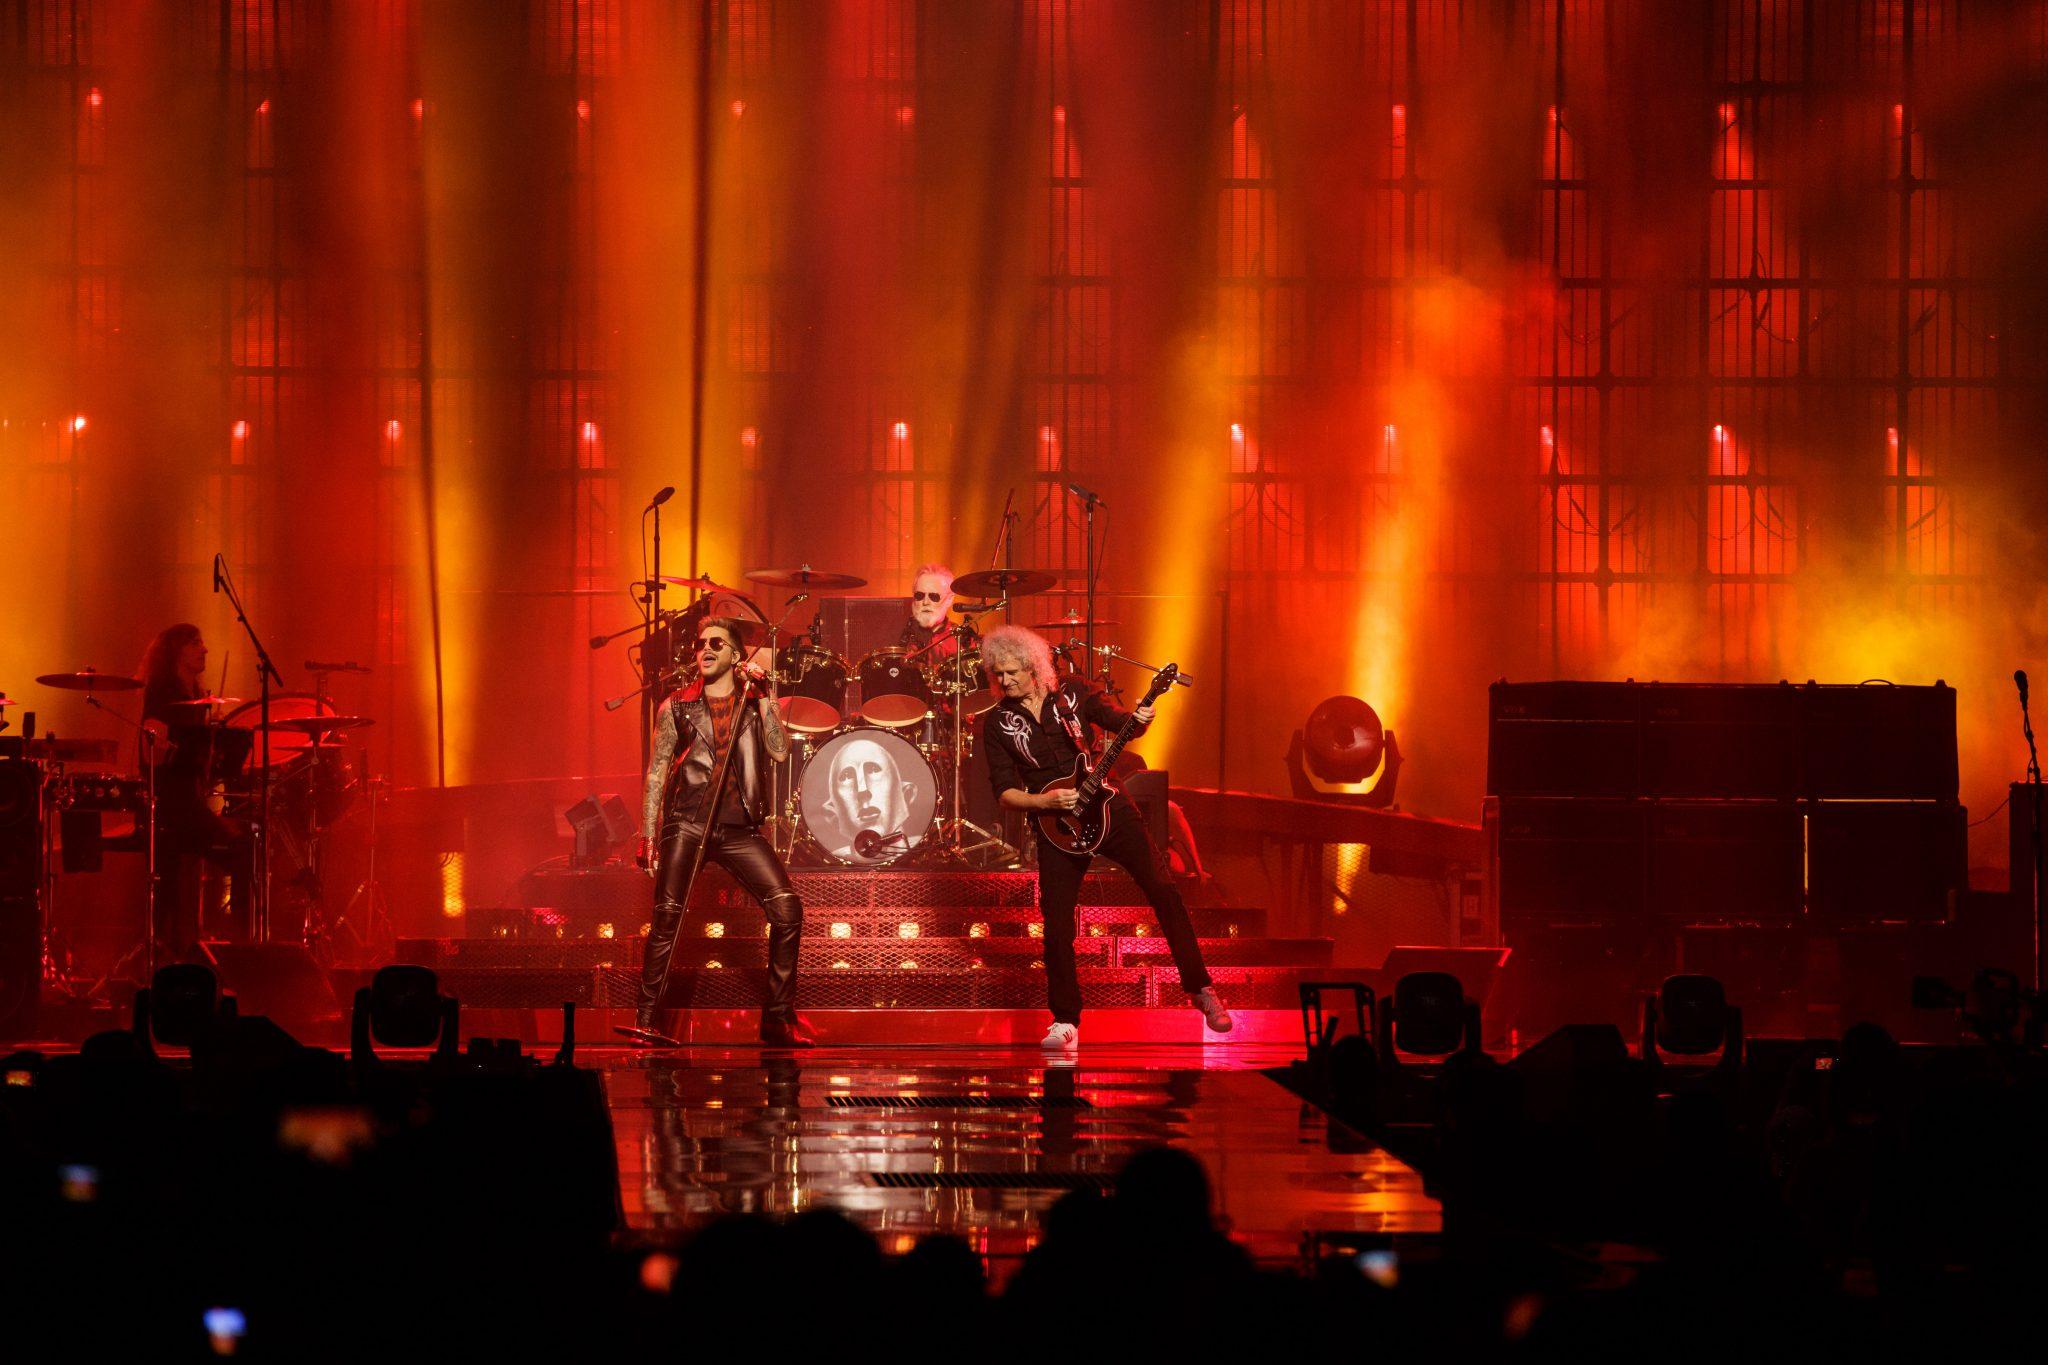 Queen + Adam Lambert The Rhapsody Tour | Adelaide Oval